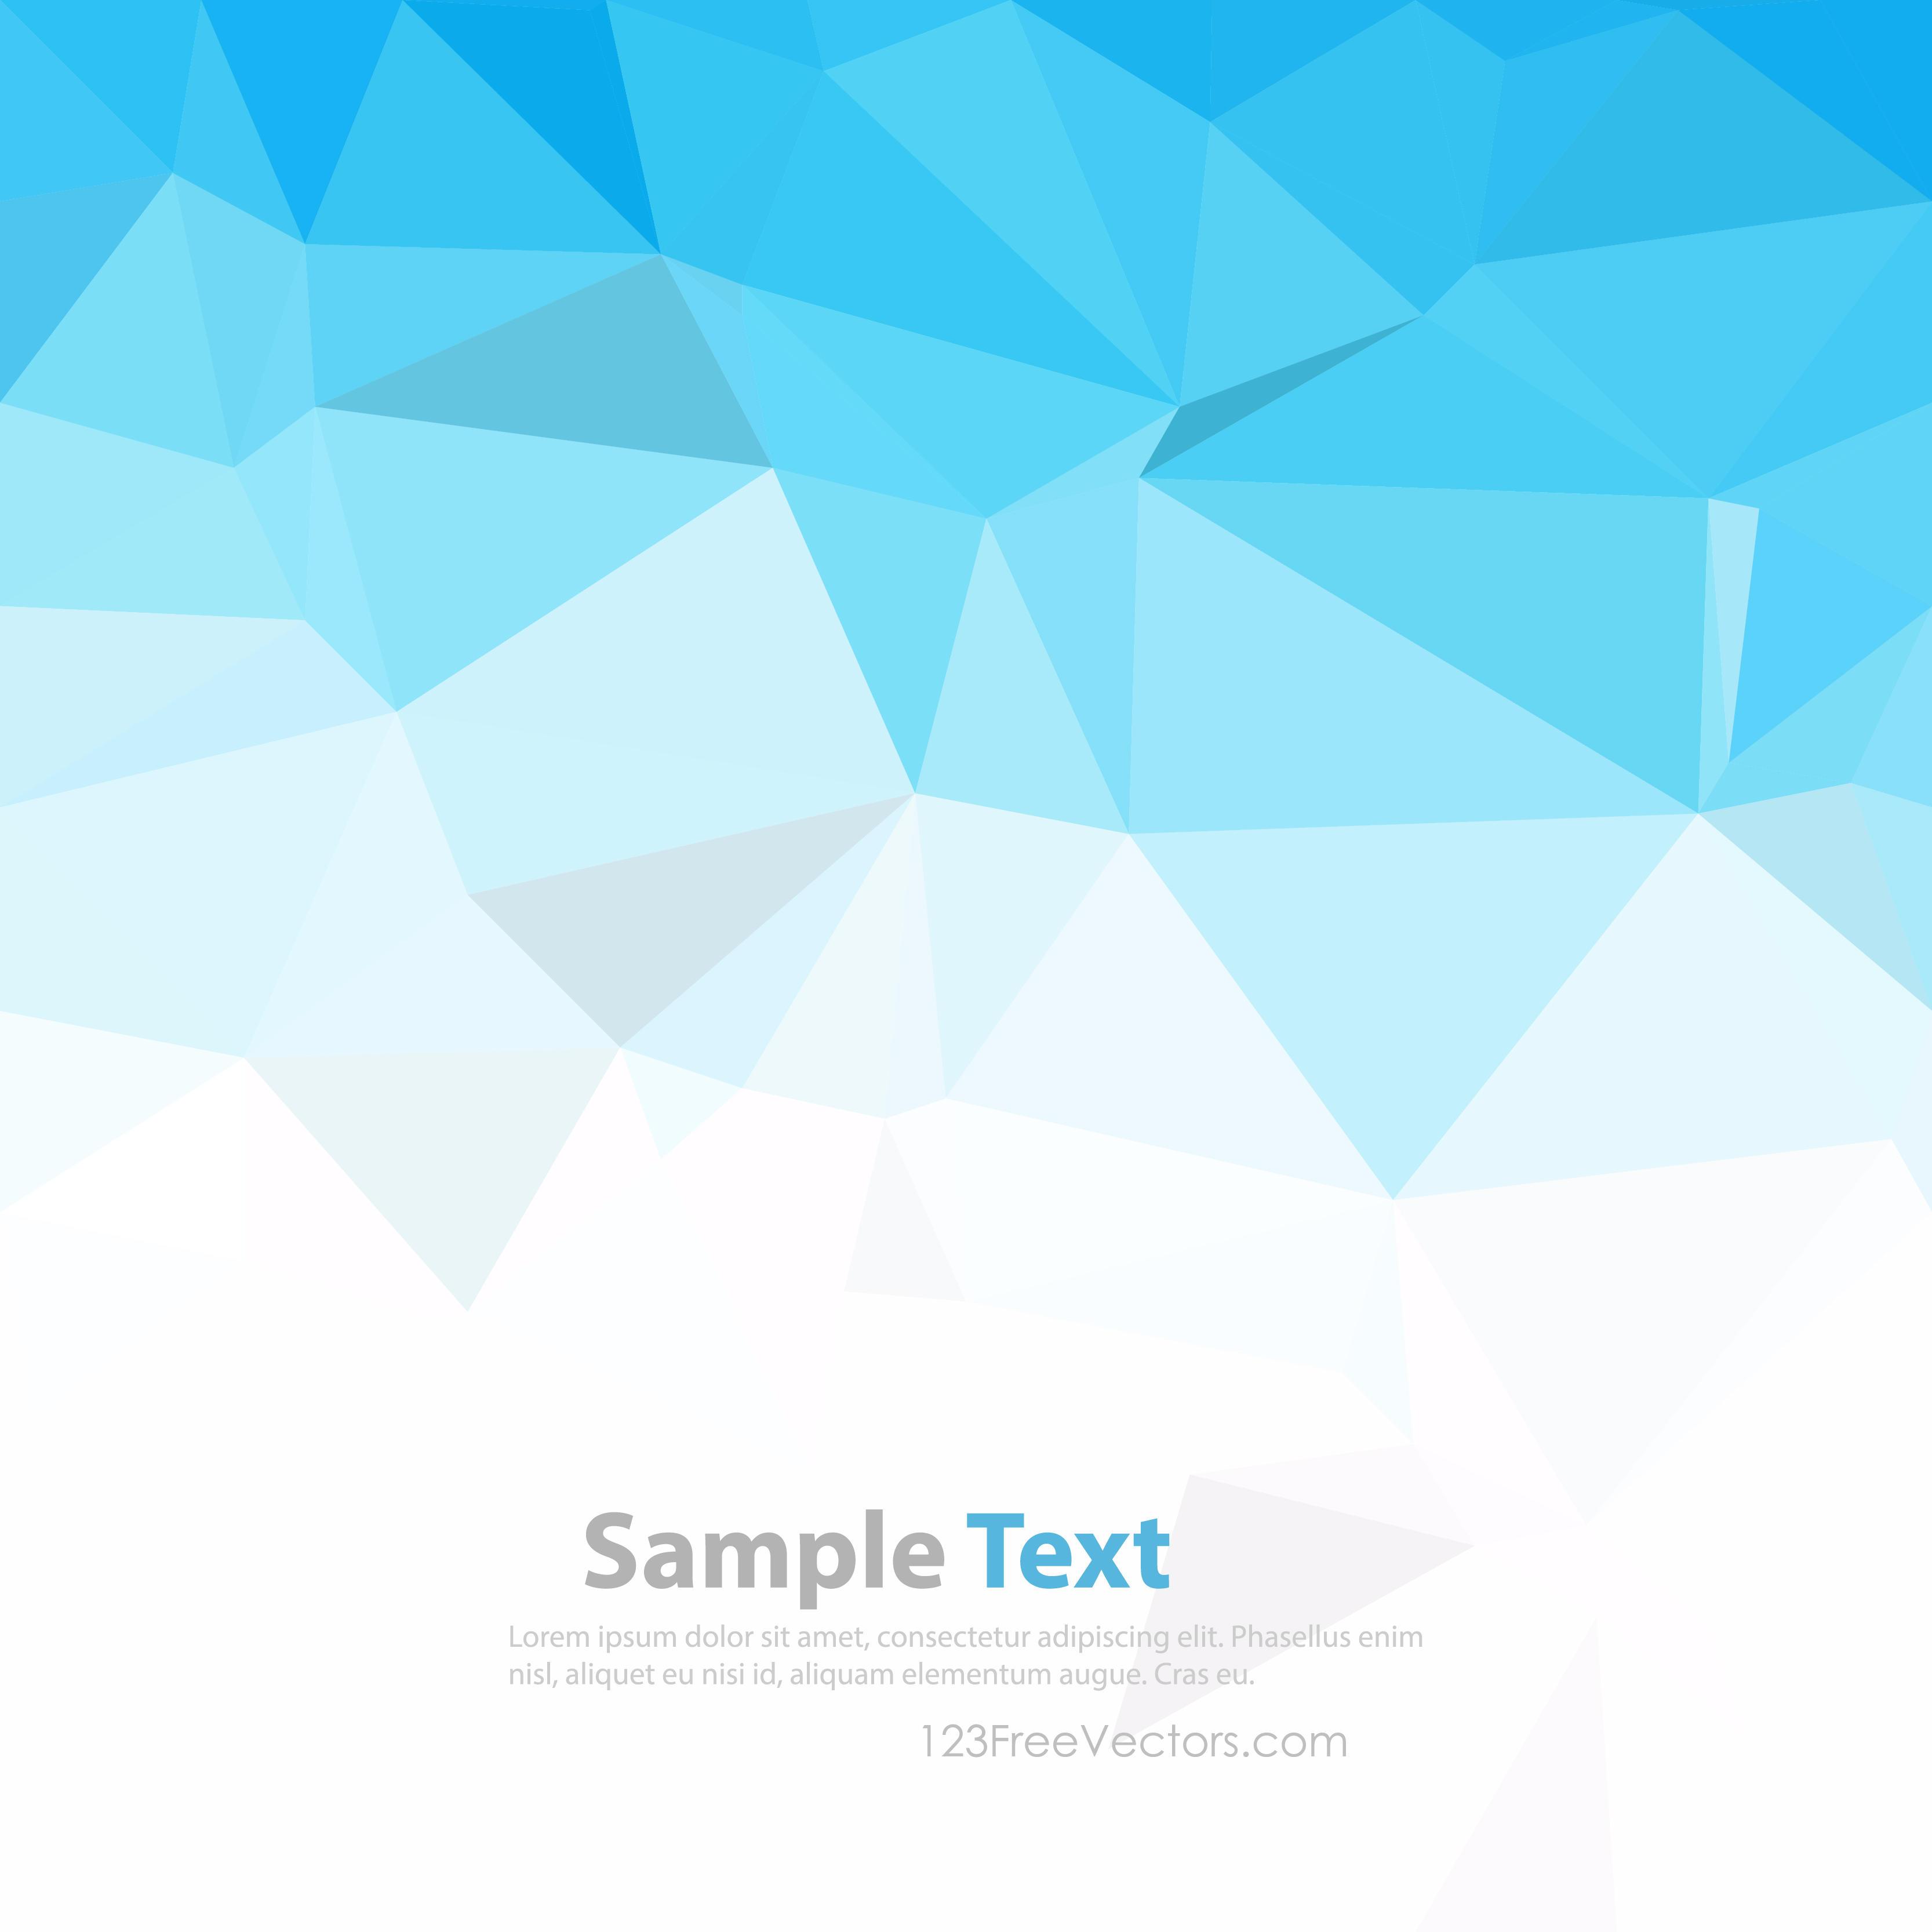 Polygonal Triangular Light Blue Wallpaper Background